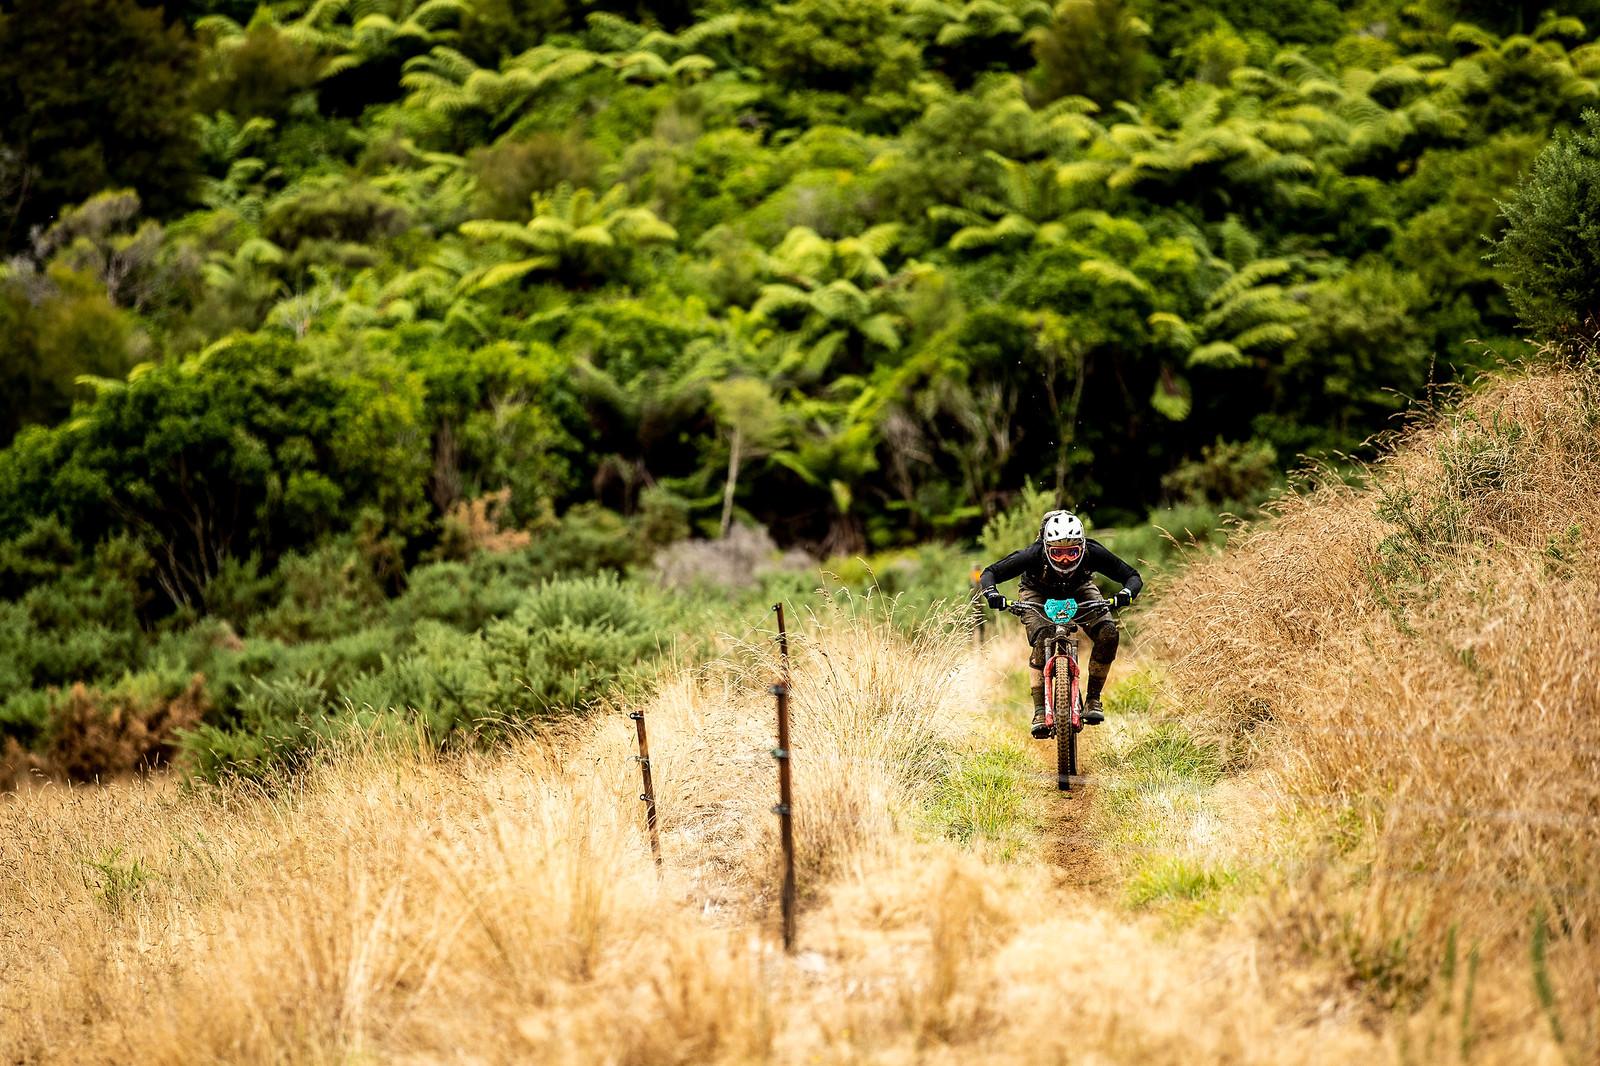 NZEnduro19  m1 8868 - 2019 NZ Enduro Day 2 Photo Gallery - Mountain Biking Pictures - Vital MTB